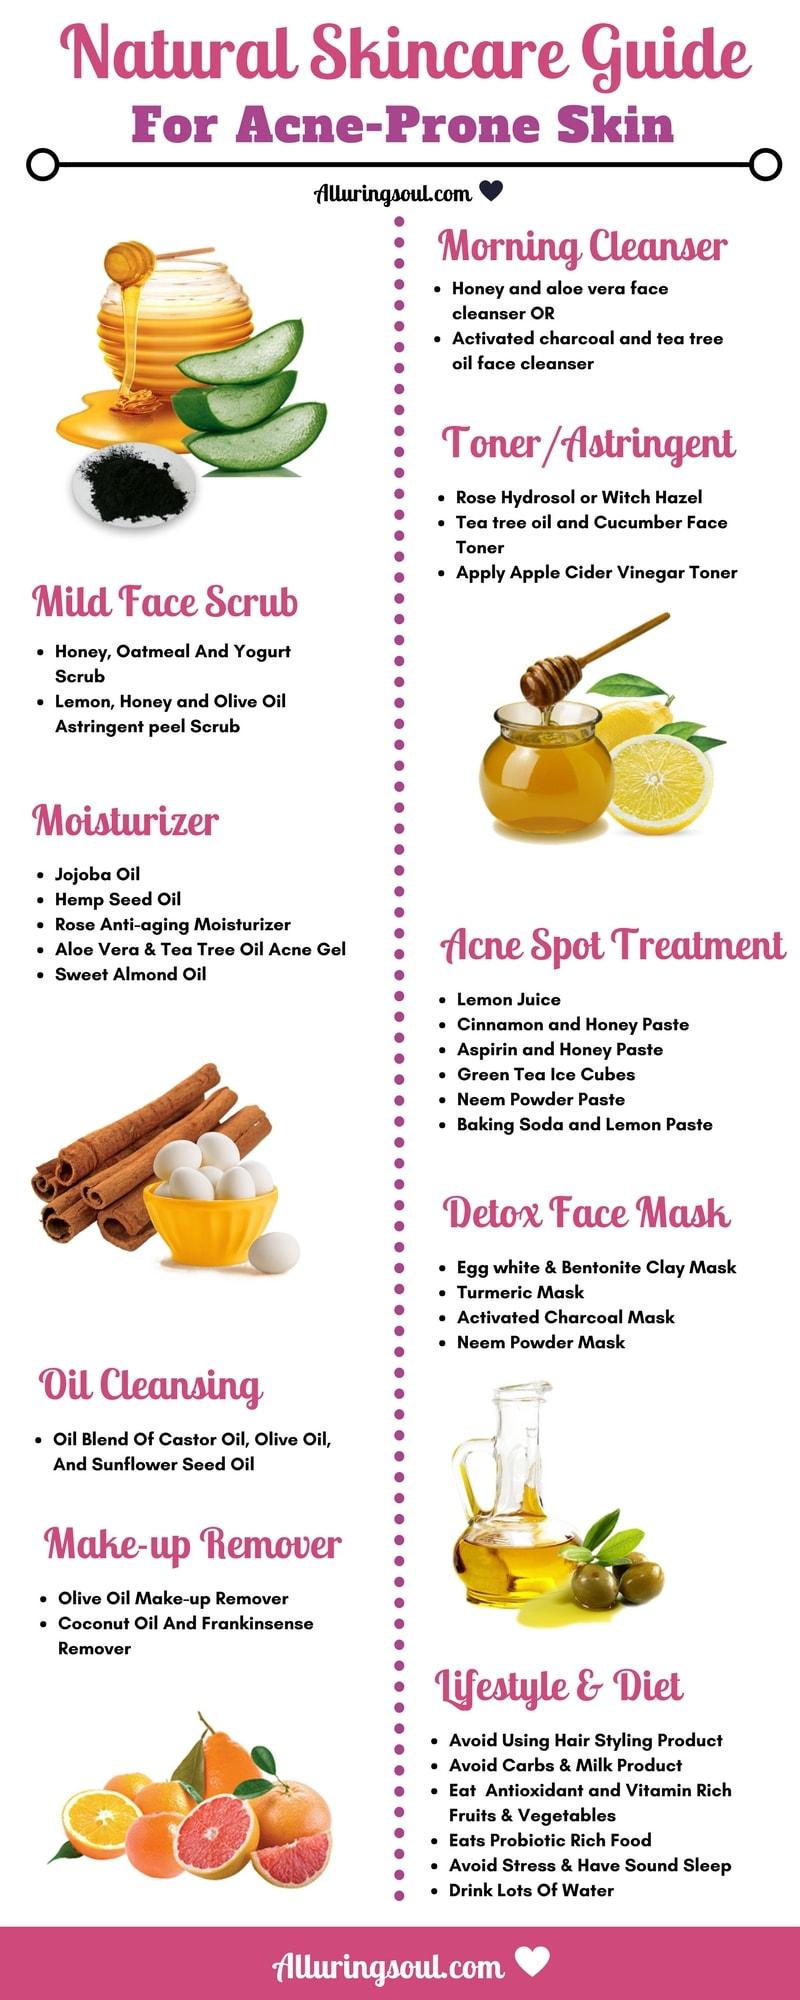 Natural Skincare Guide for Acne Prone Skin